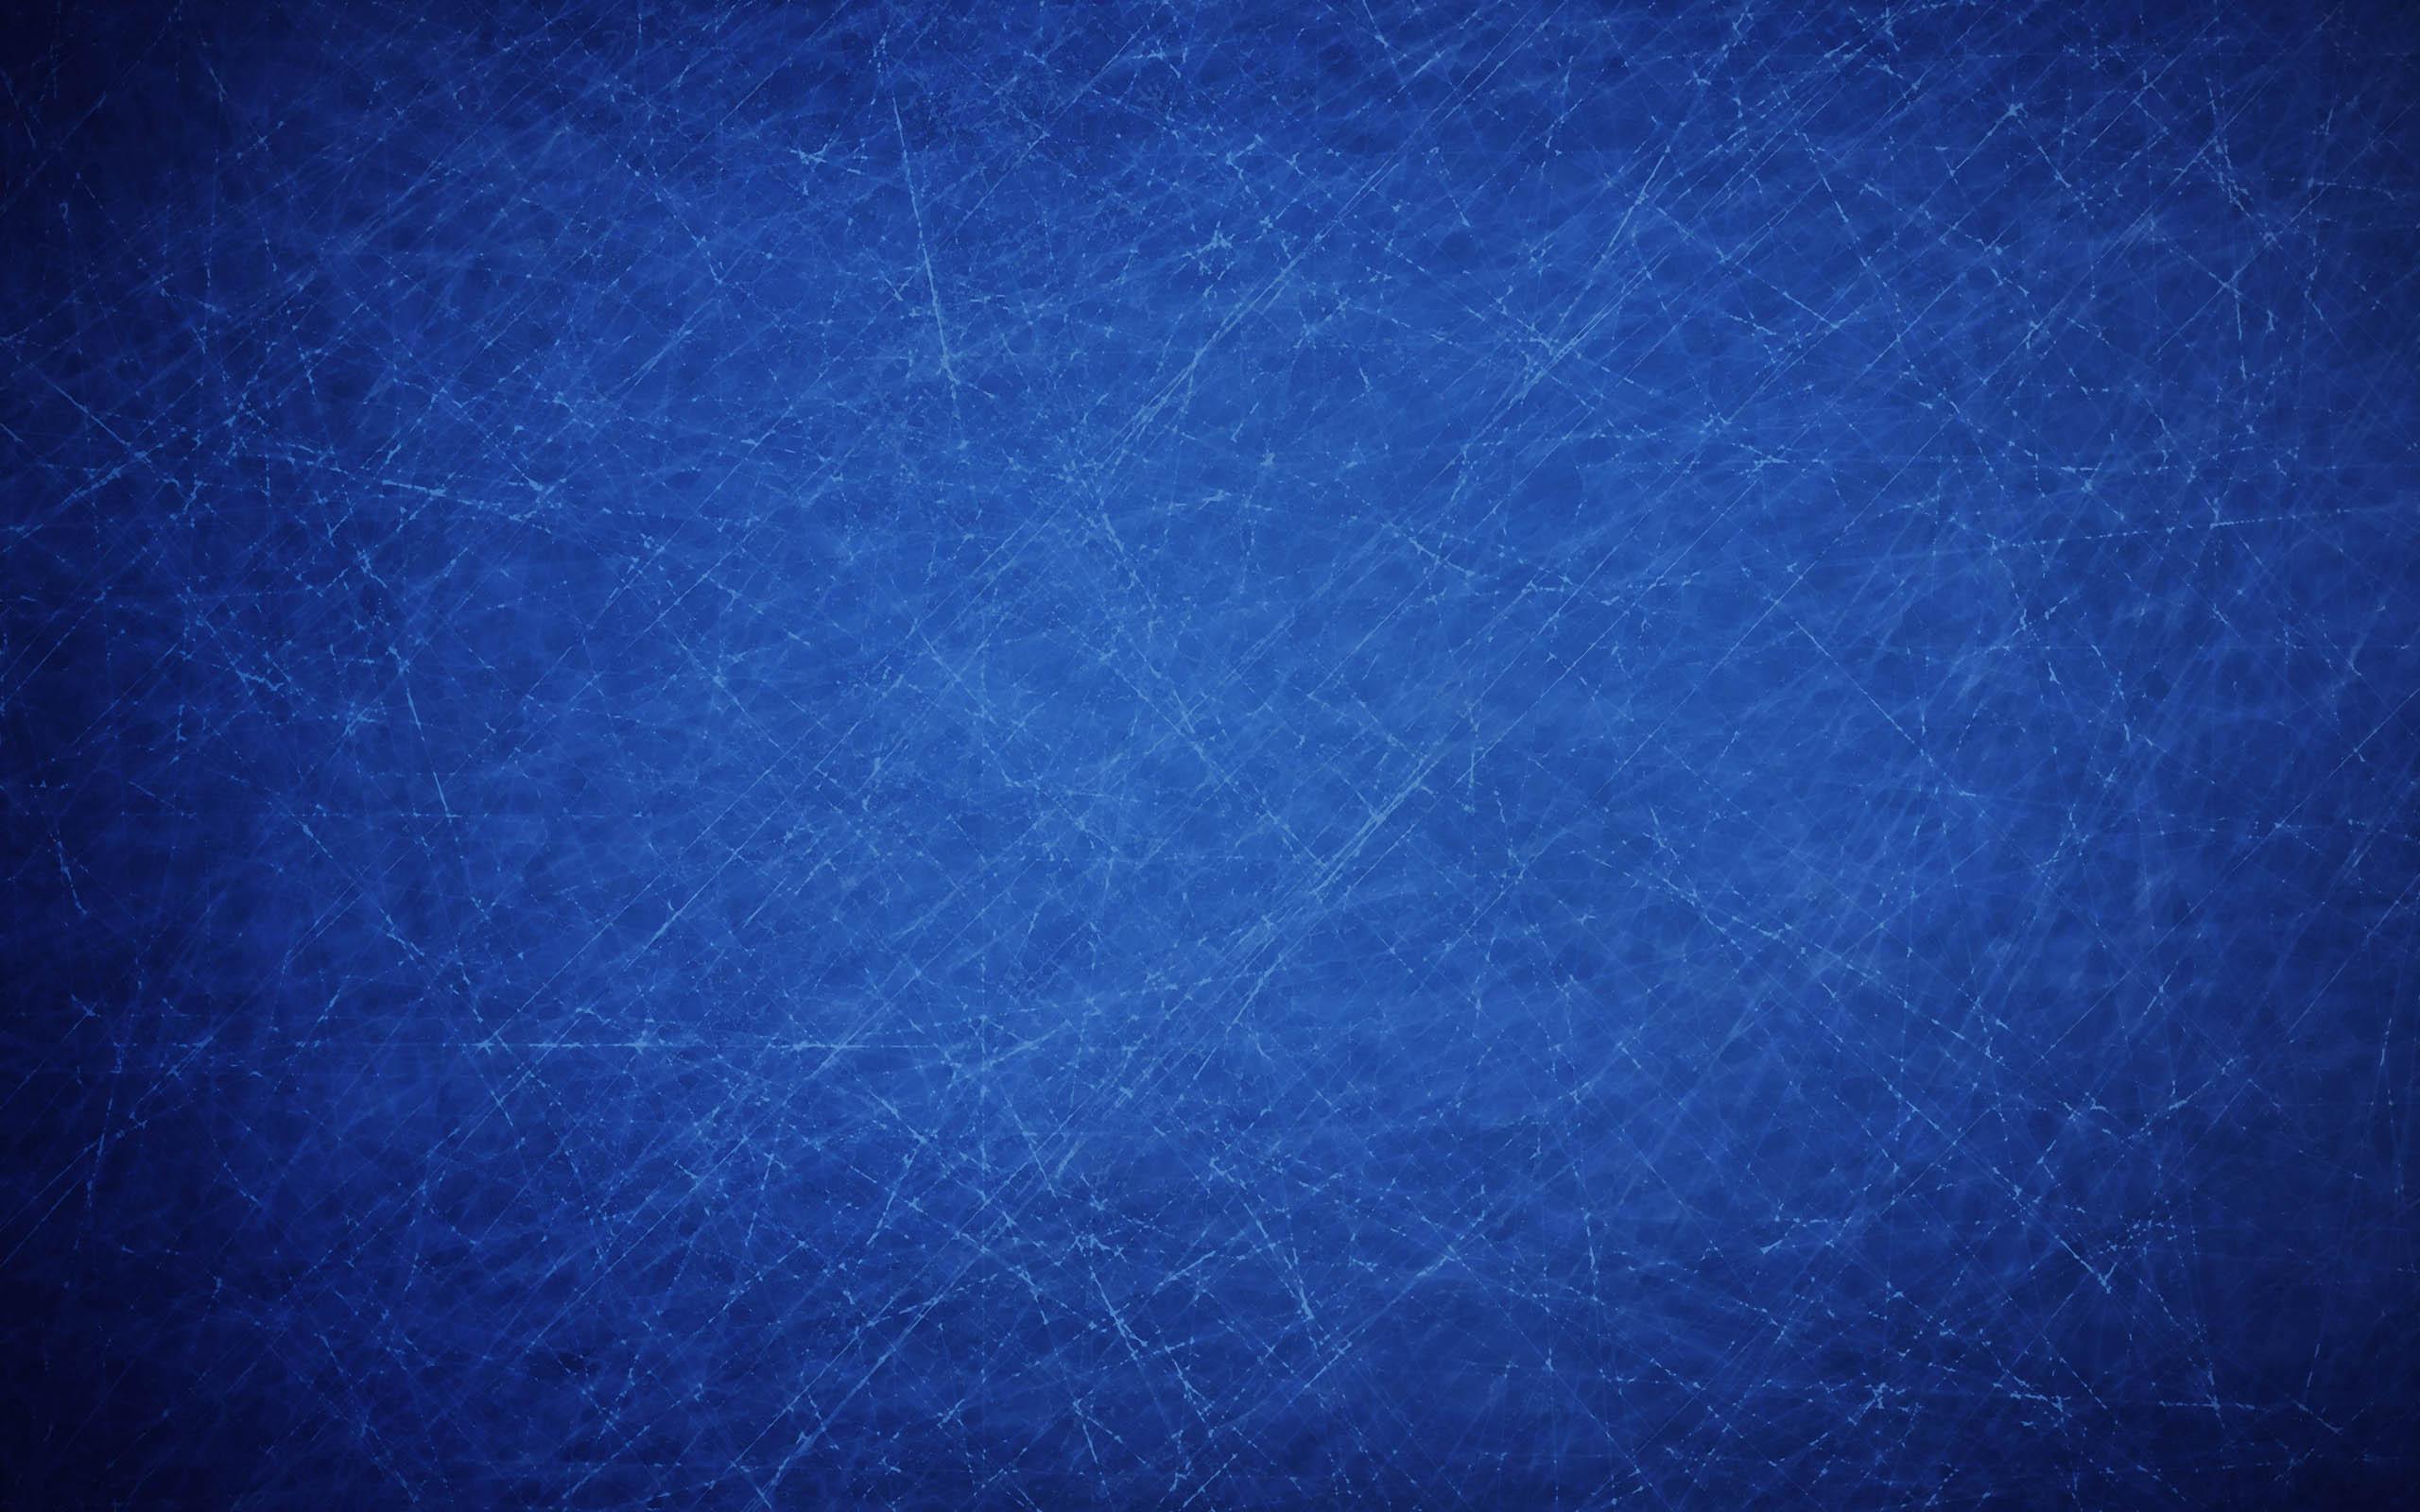 Fond Uni Design : Bleu full hd fond d écran and arrière plan